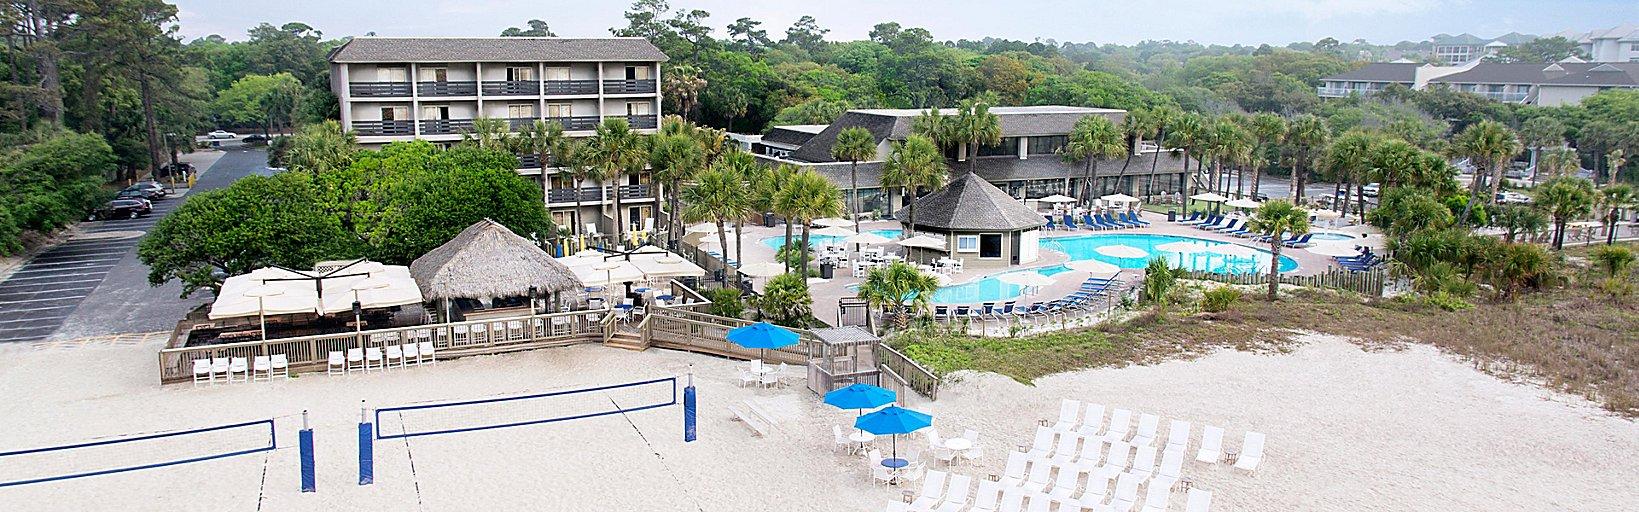 Hilton Head Resorts >> Oceanfront Hilton Head Resorts Holiday Inn Resort Beach House